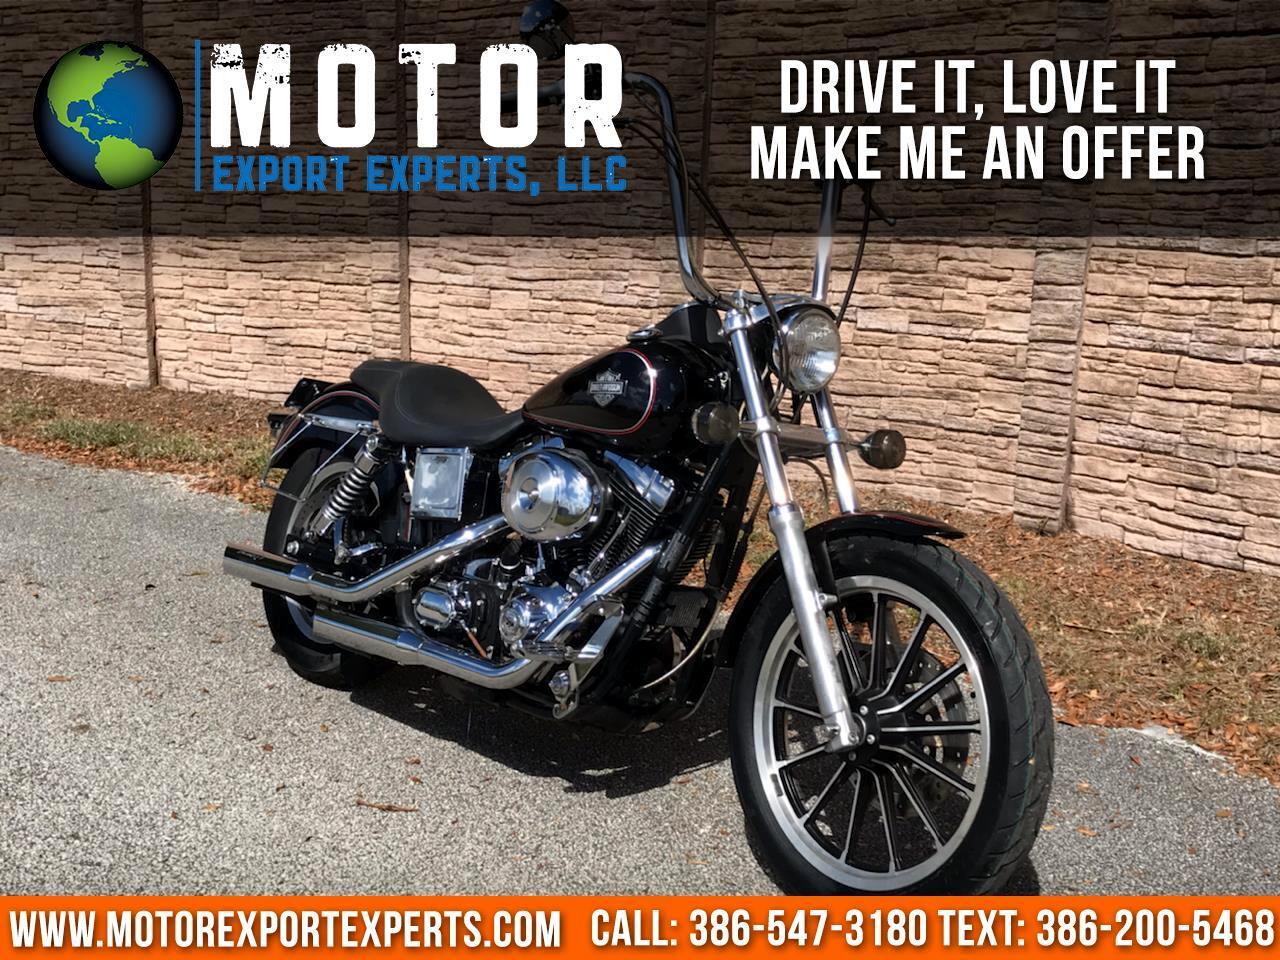 2001 Harley-Davidson FXDL DYNA LOW RIDER